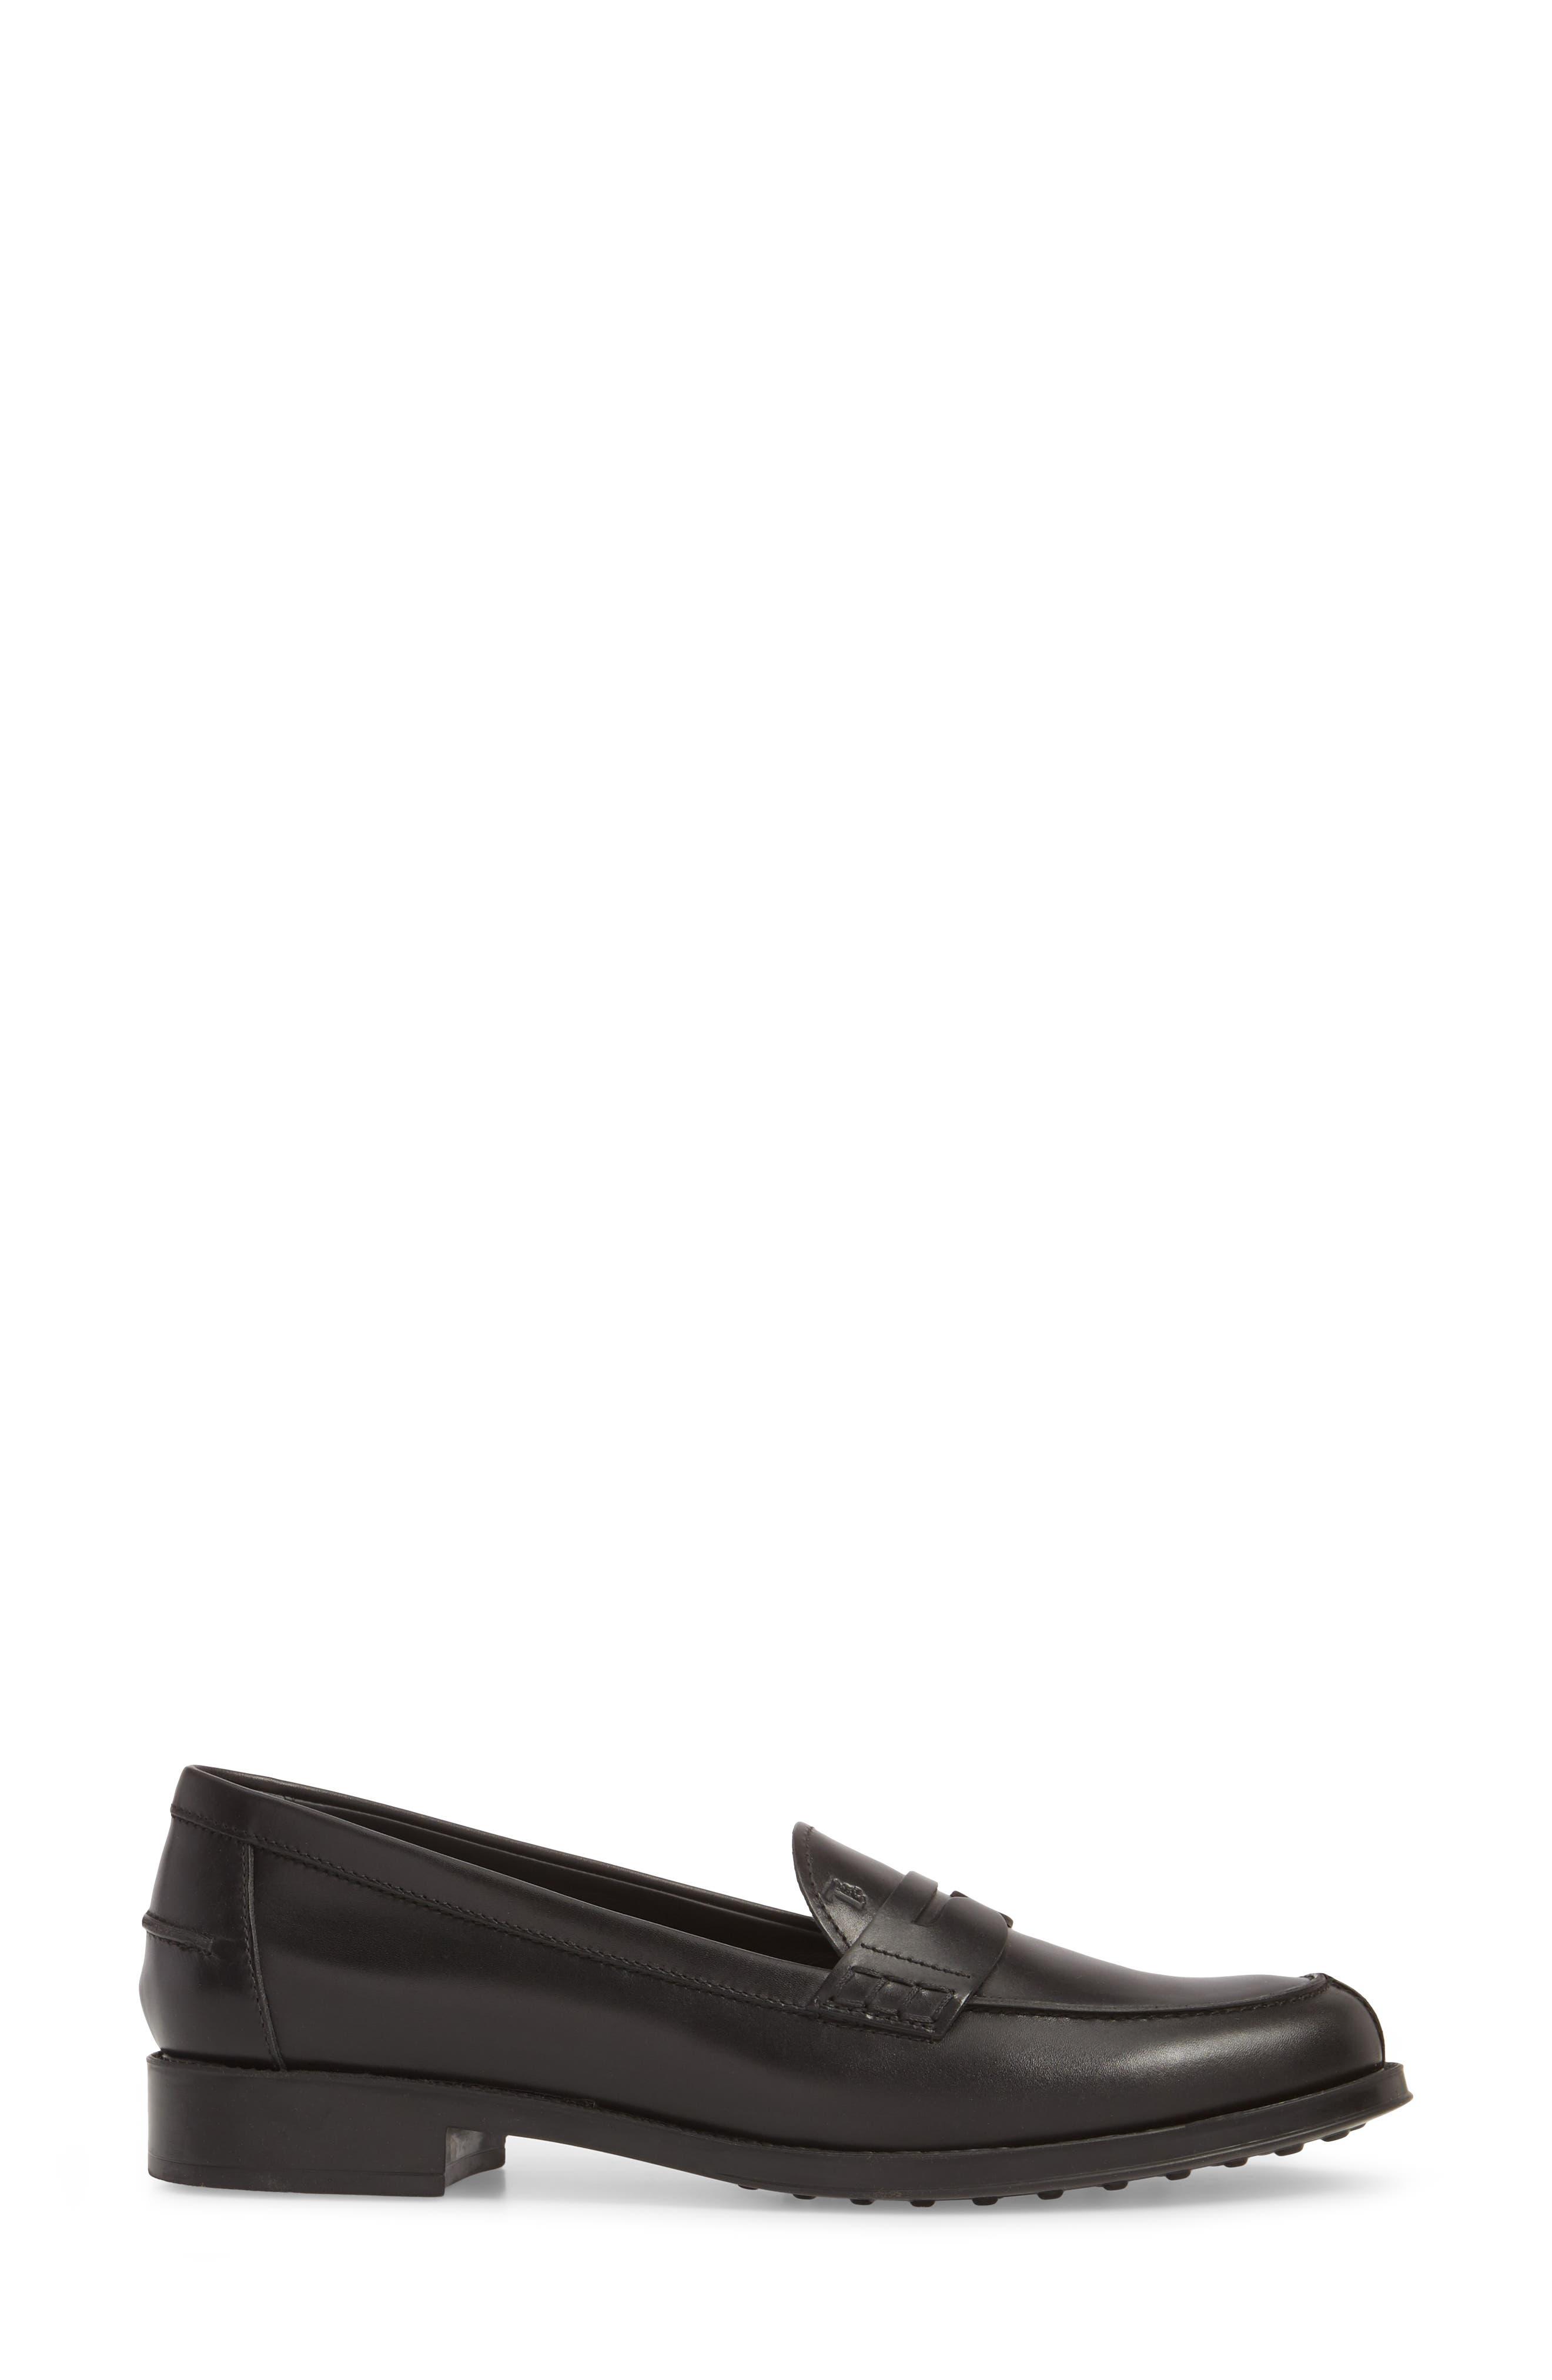 Penny Loafer,                             Alternate thumbnail 3, color,                             BLACK